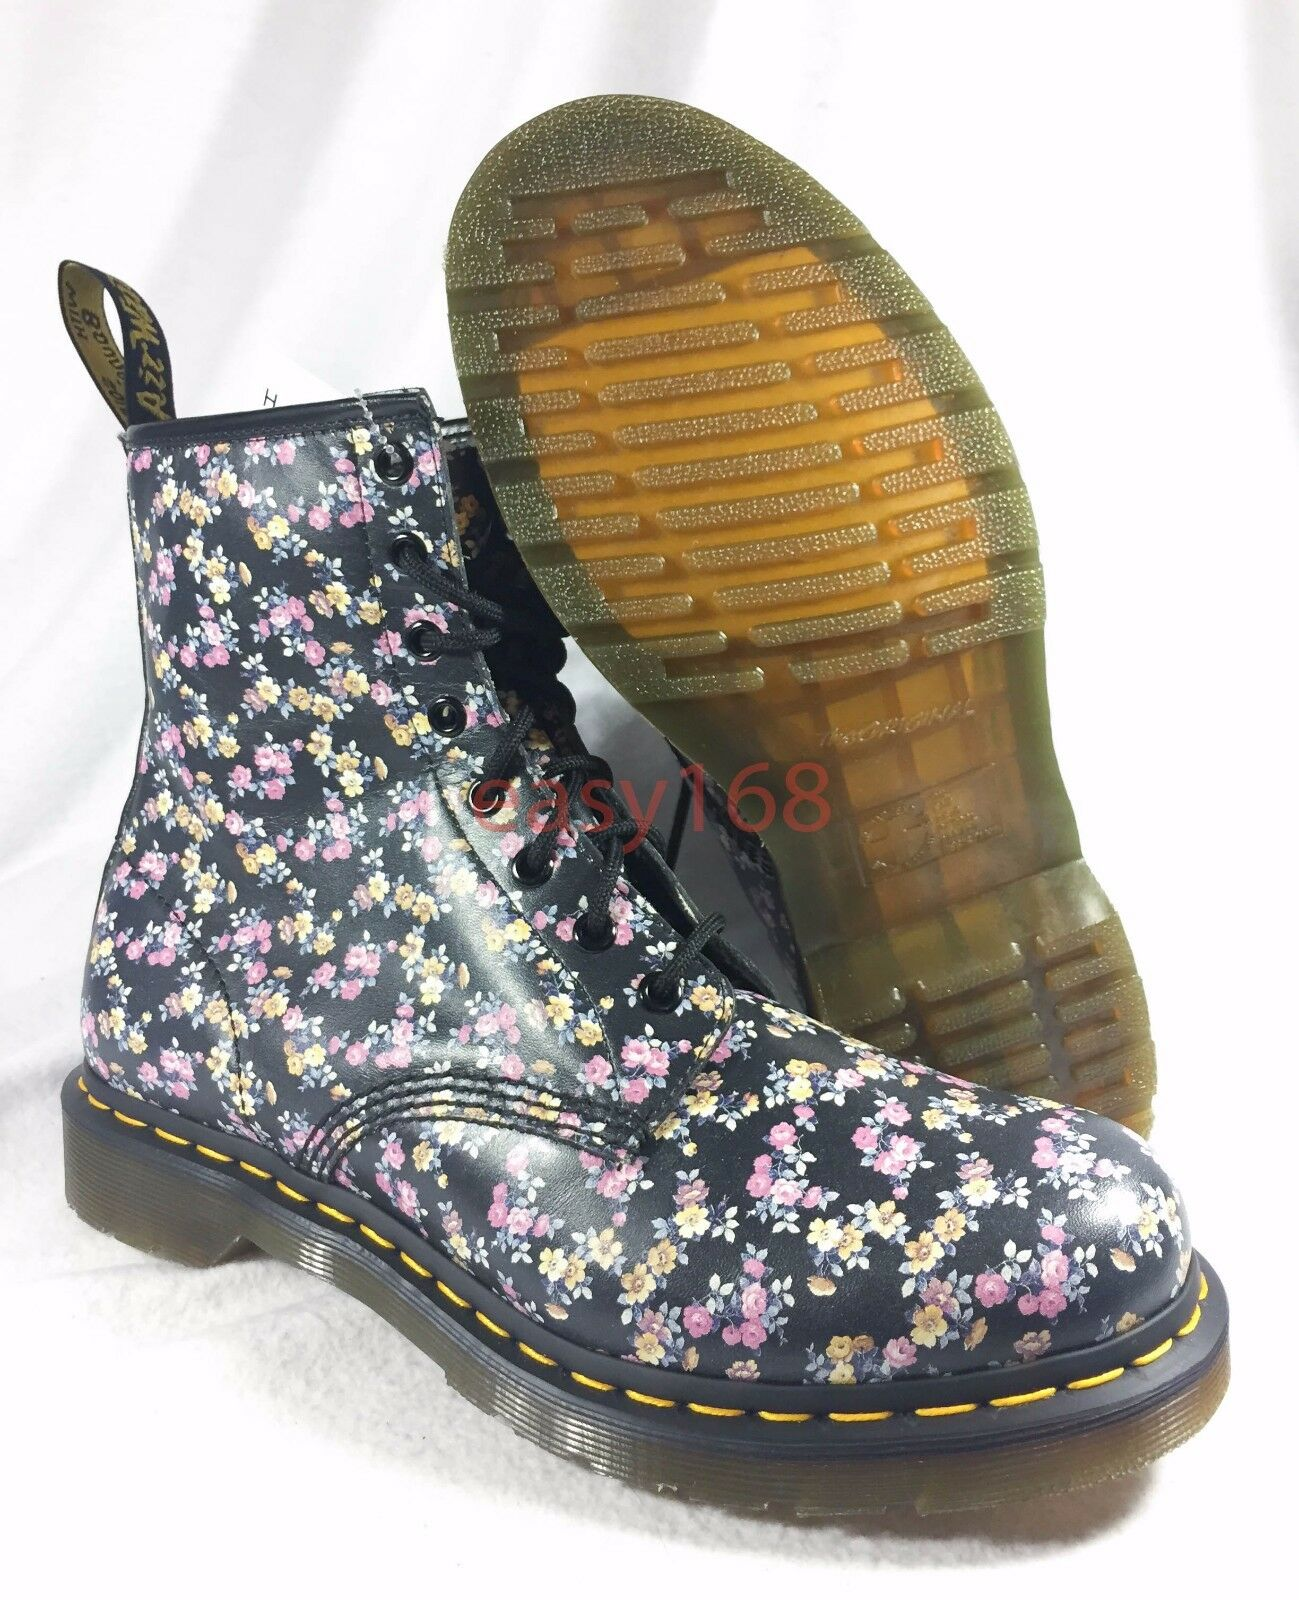 New Dr Martens 1460 W Sz 11 Floral 8-eye Boot Air Black 11 Womens Flower 9 UK